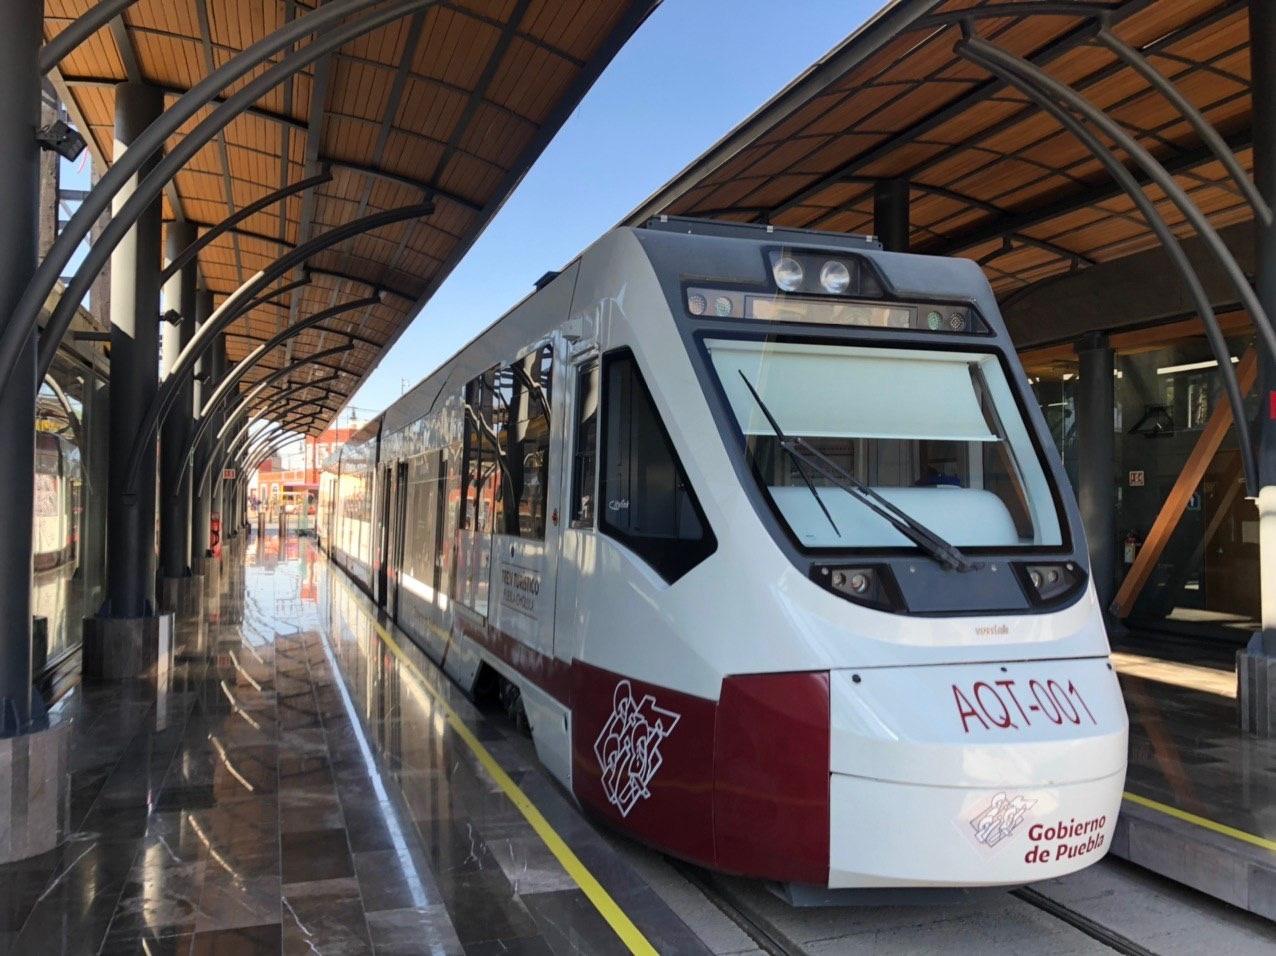 Tren turístico debería utilizarse como transporte suburbano: Arriaga